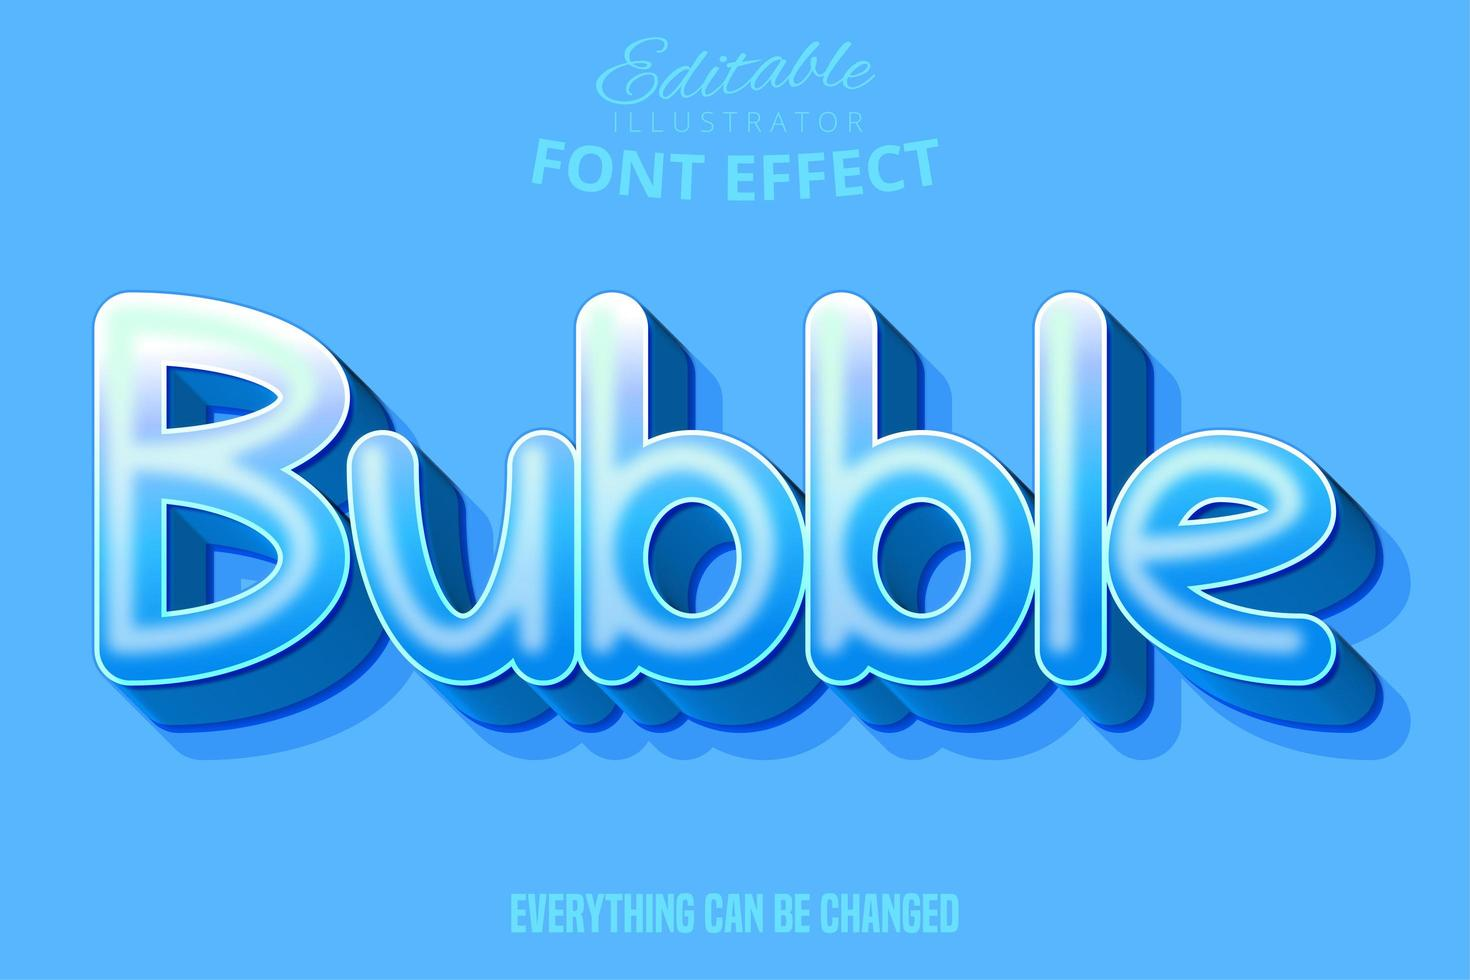 texto de burbuja, efecto de fuente editable vector